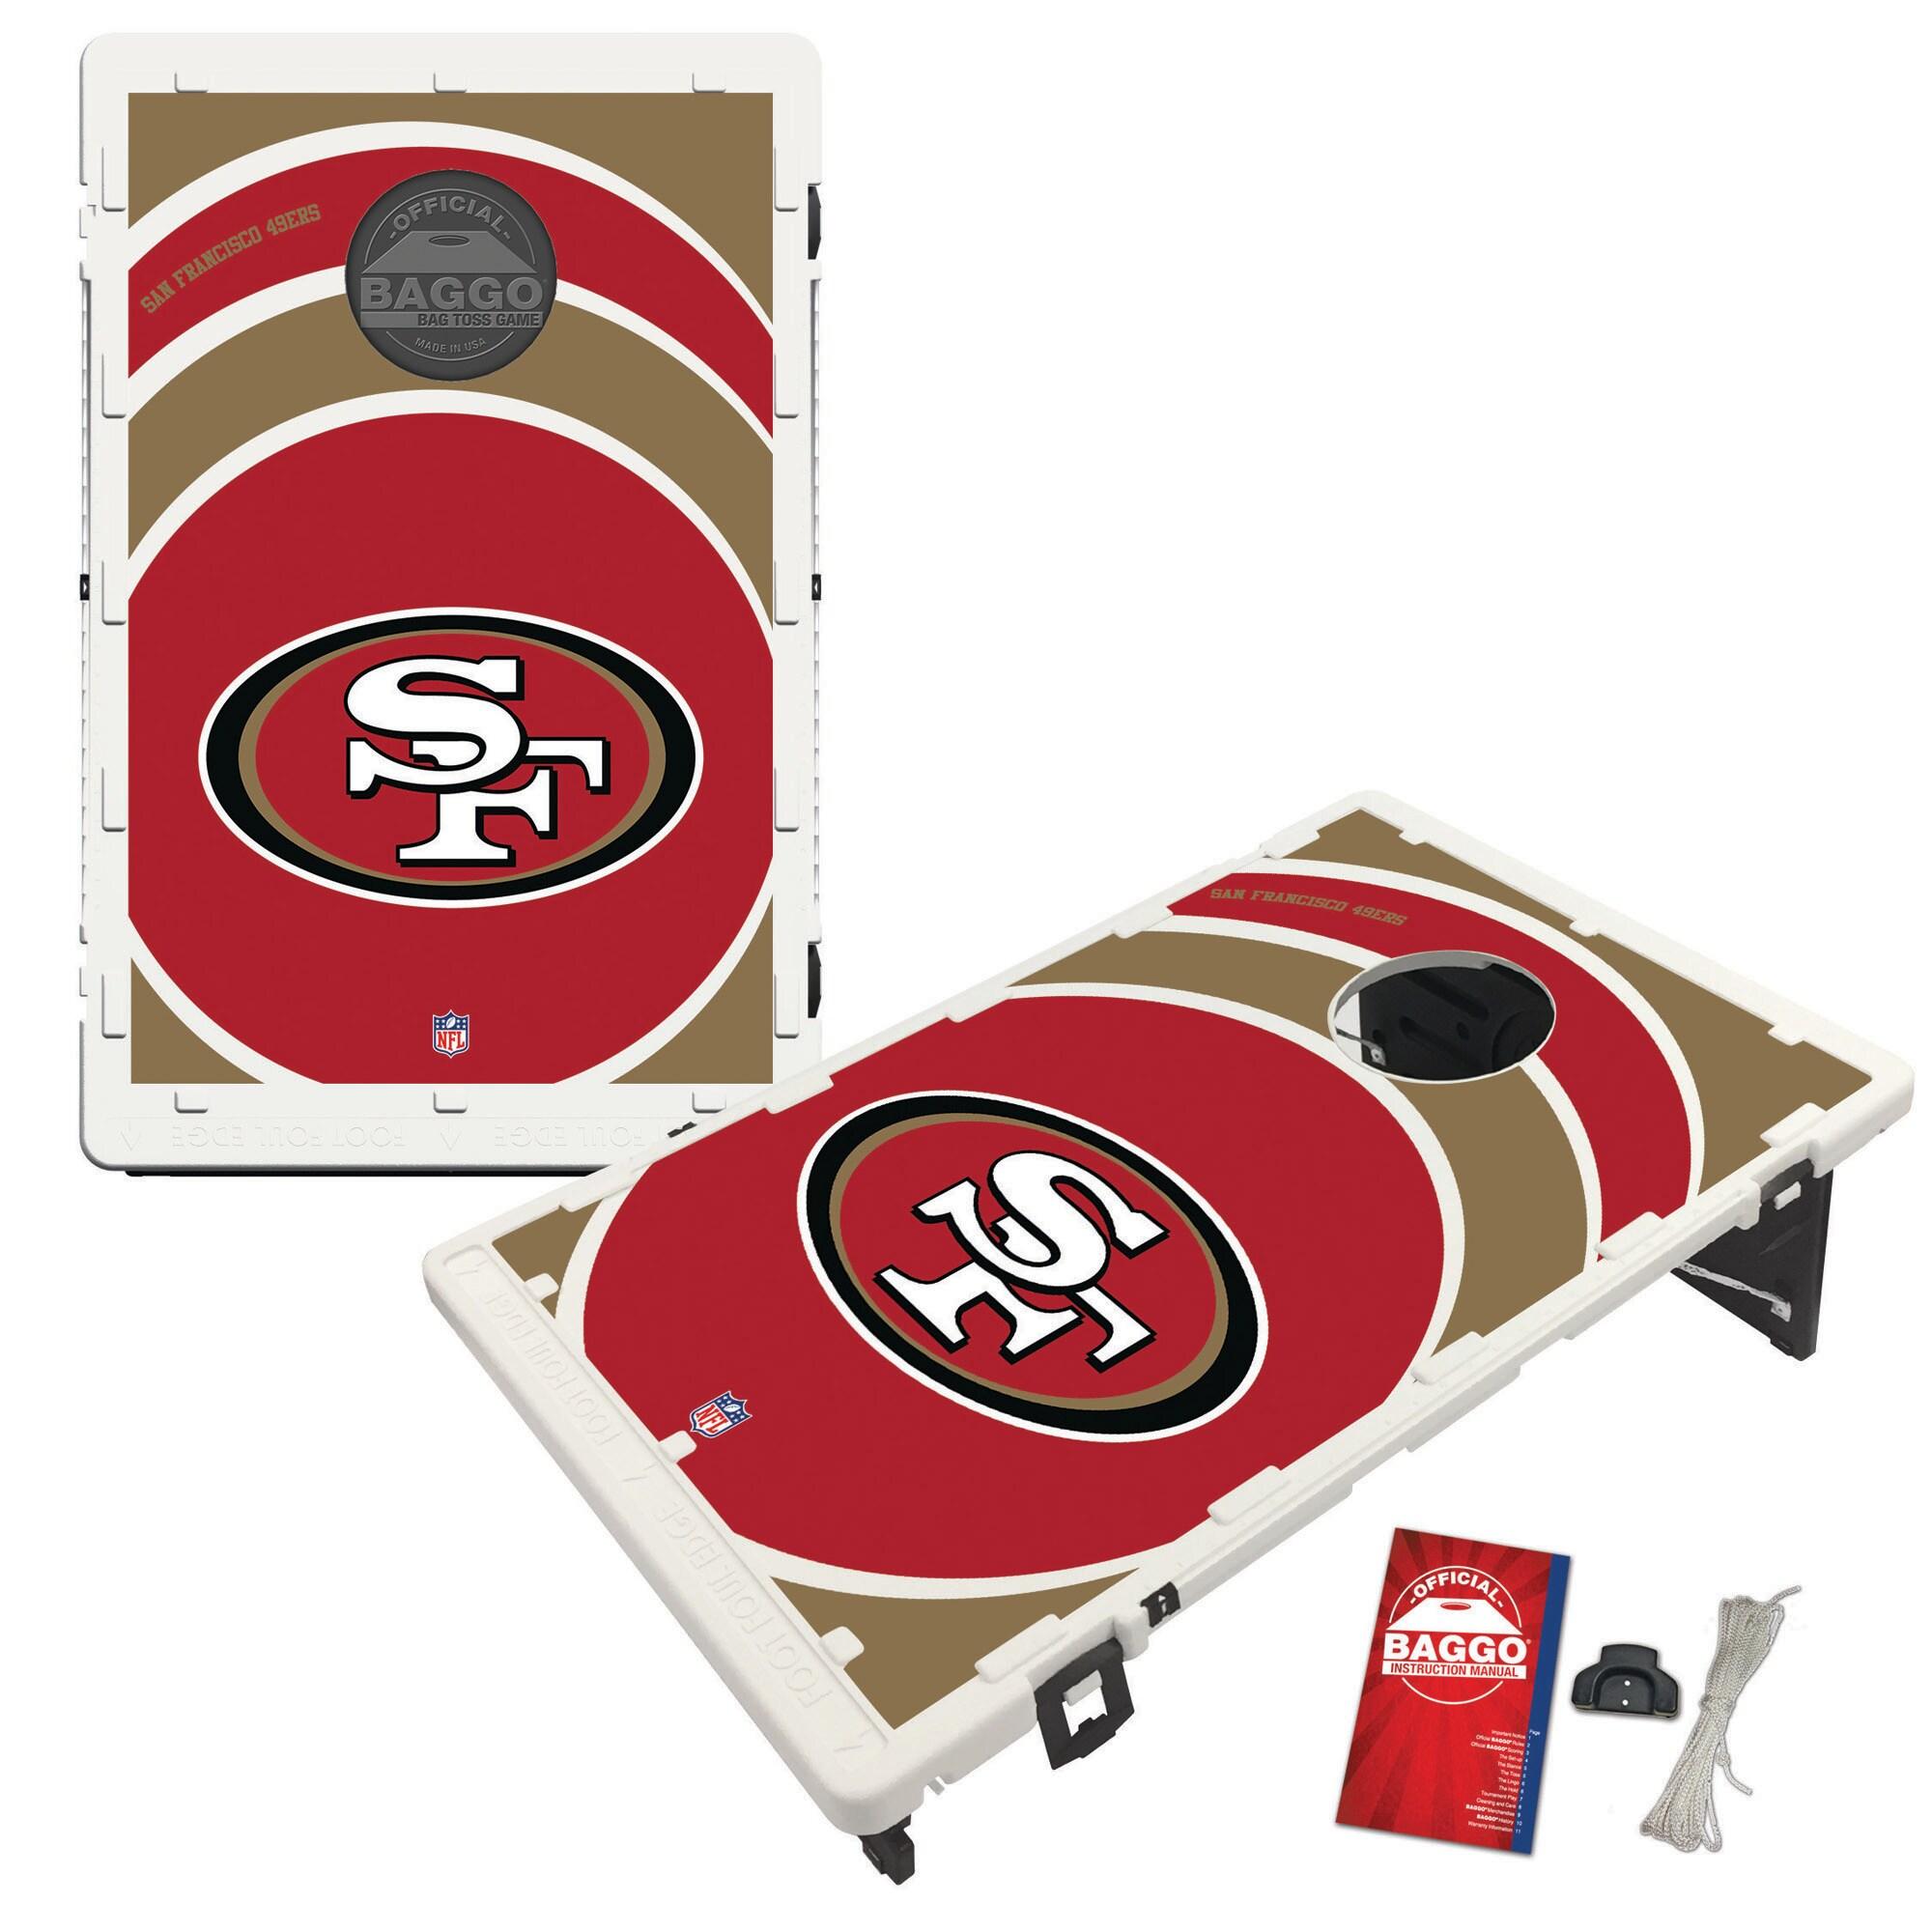 San Francisco 49ers 2' x 3' BAGGO Vortex Cornhole Board Tailgate Toss Set